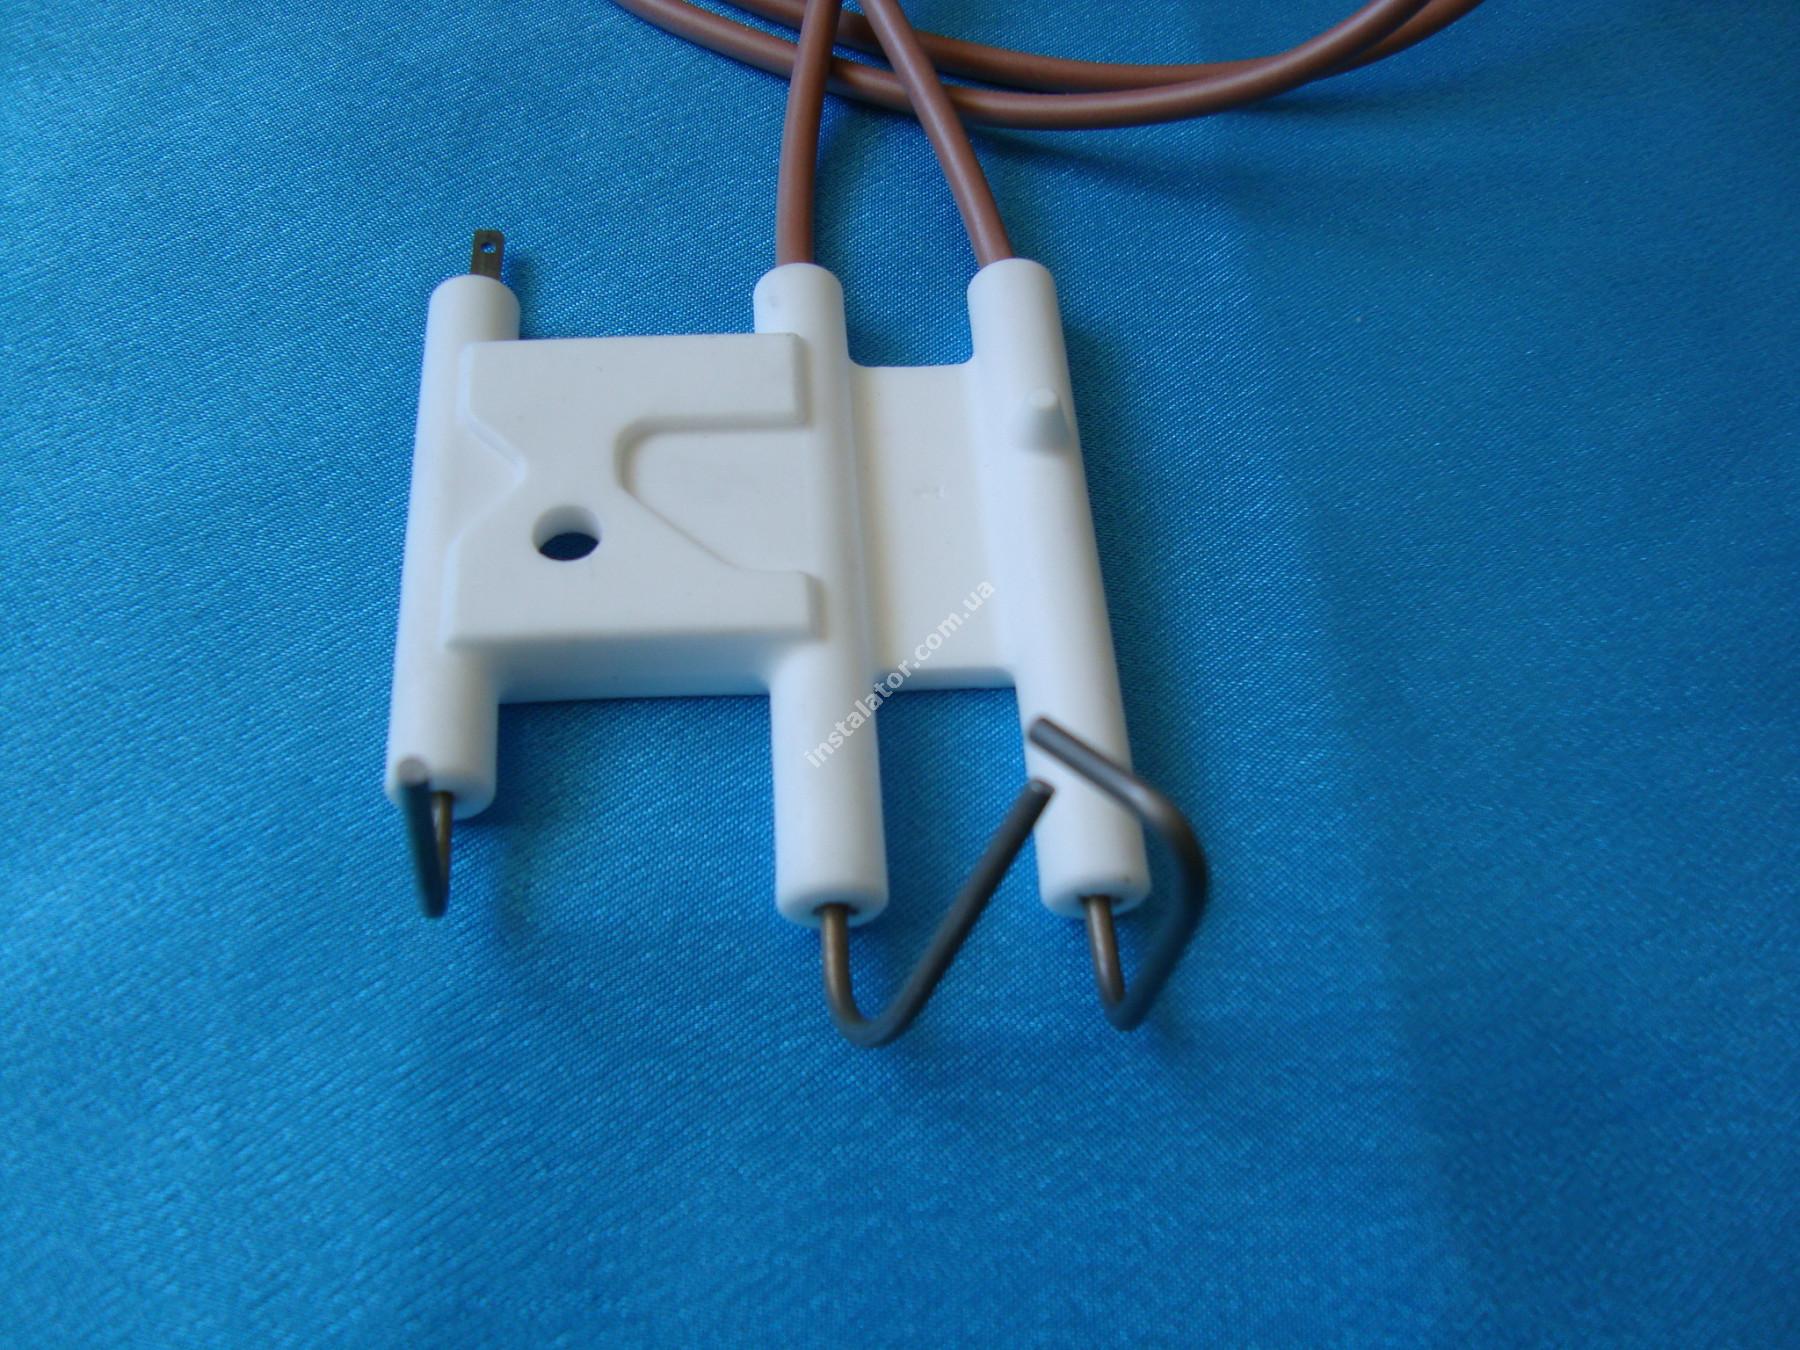 0020039057 Група електродів  VAILLANT atmoTec, turboTec Pro\Plus   full-image-3